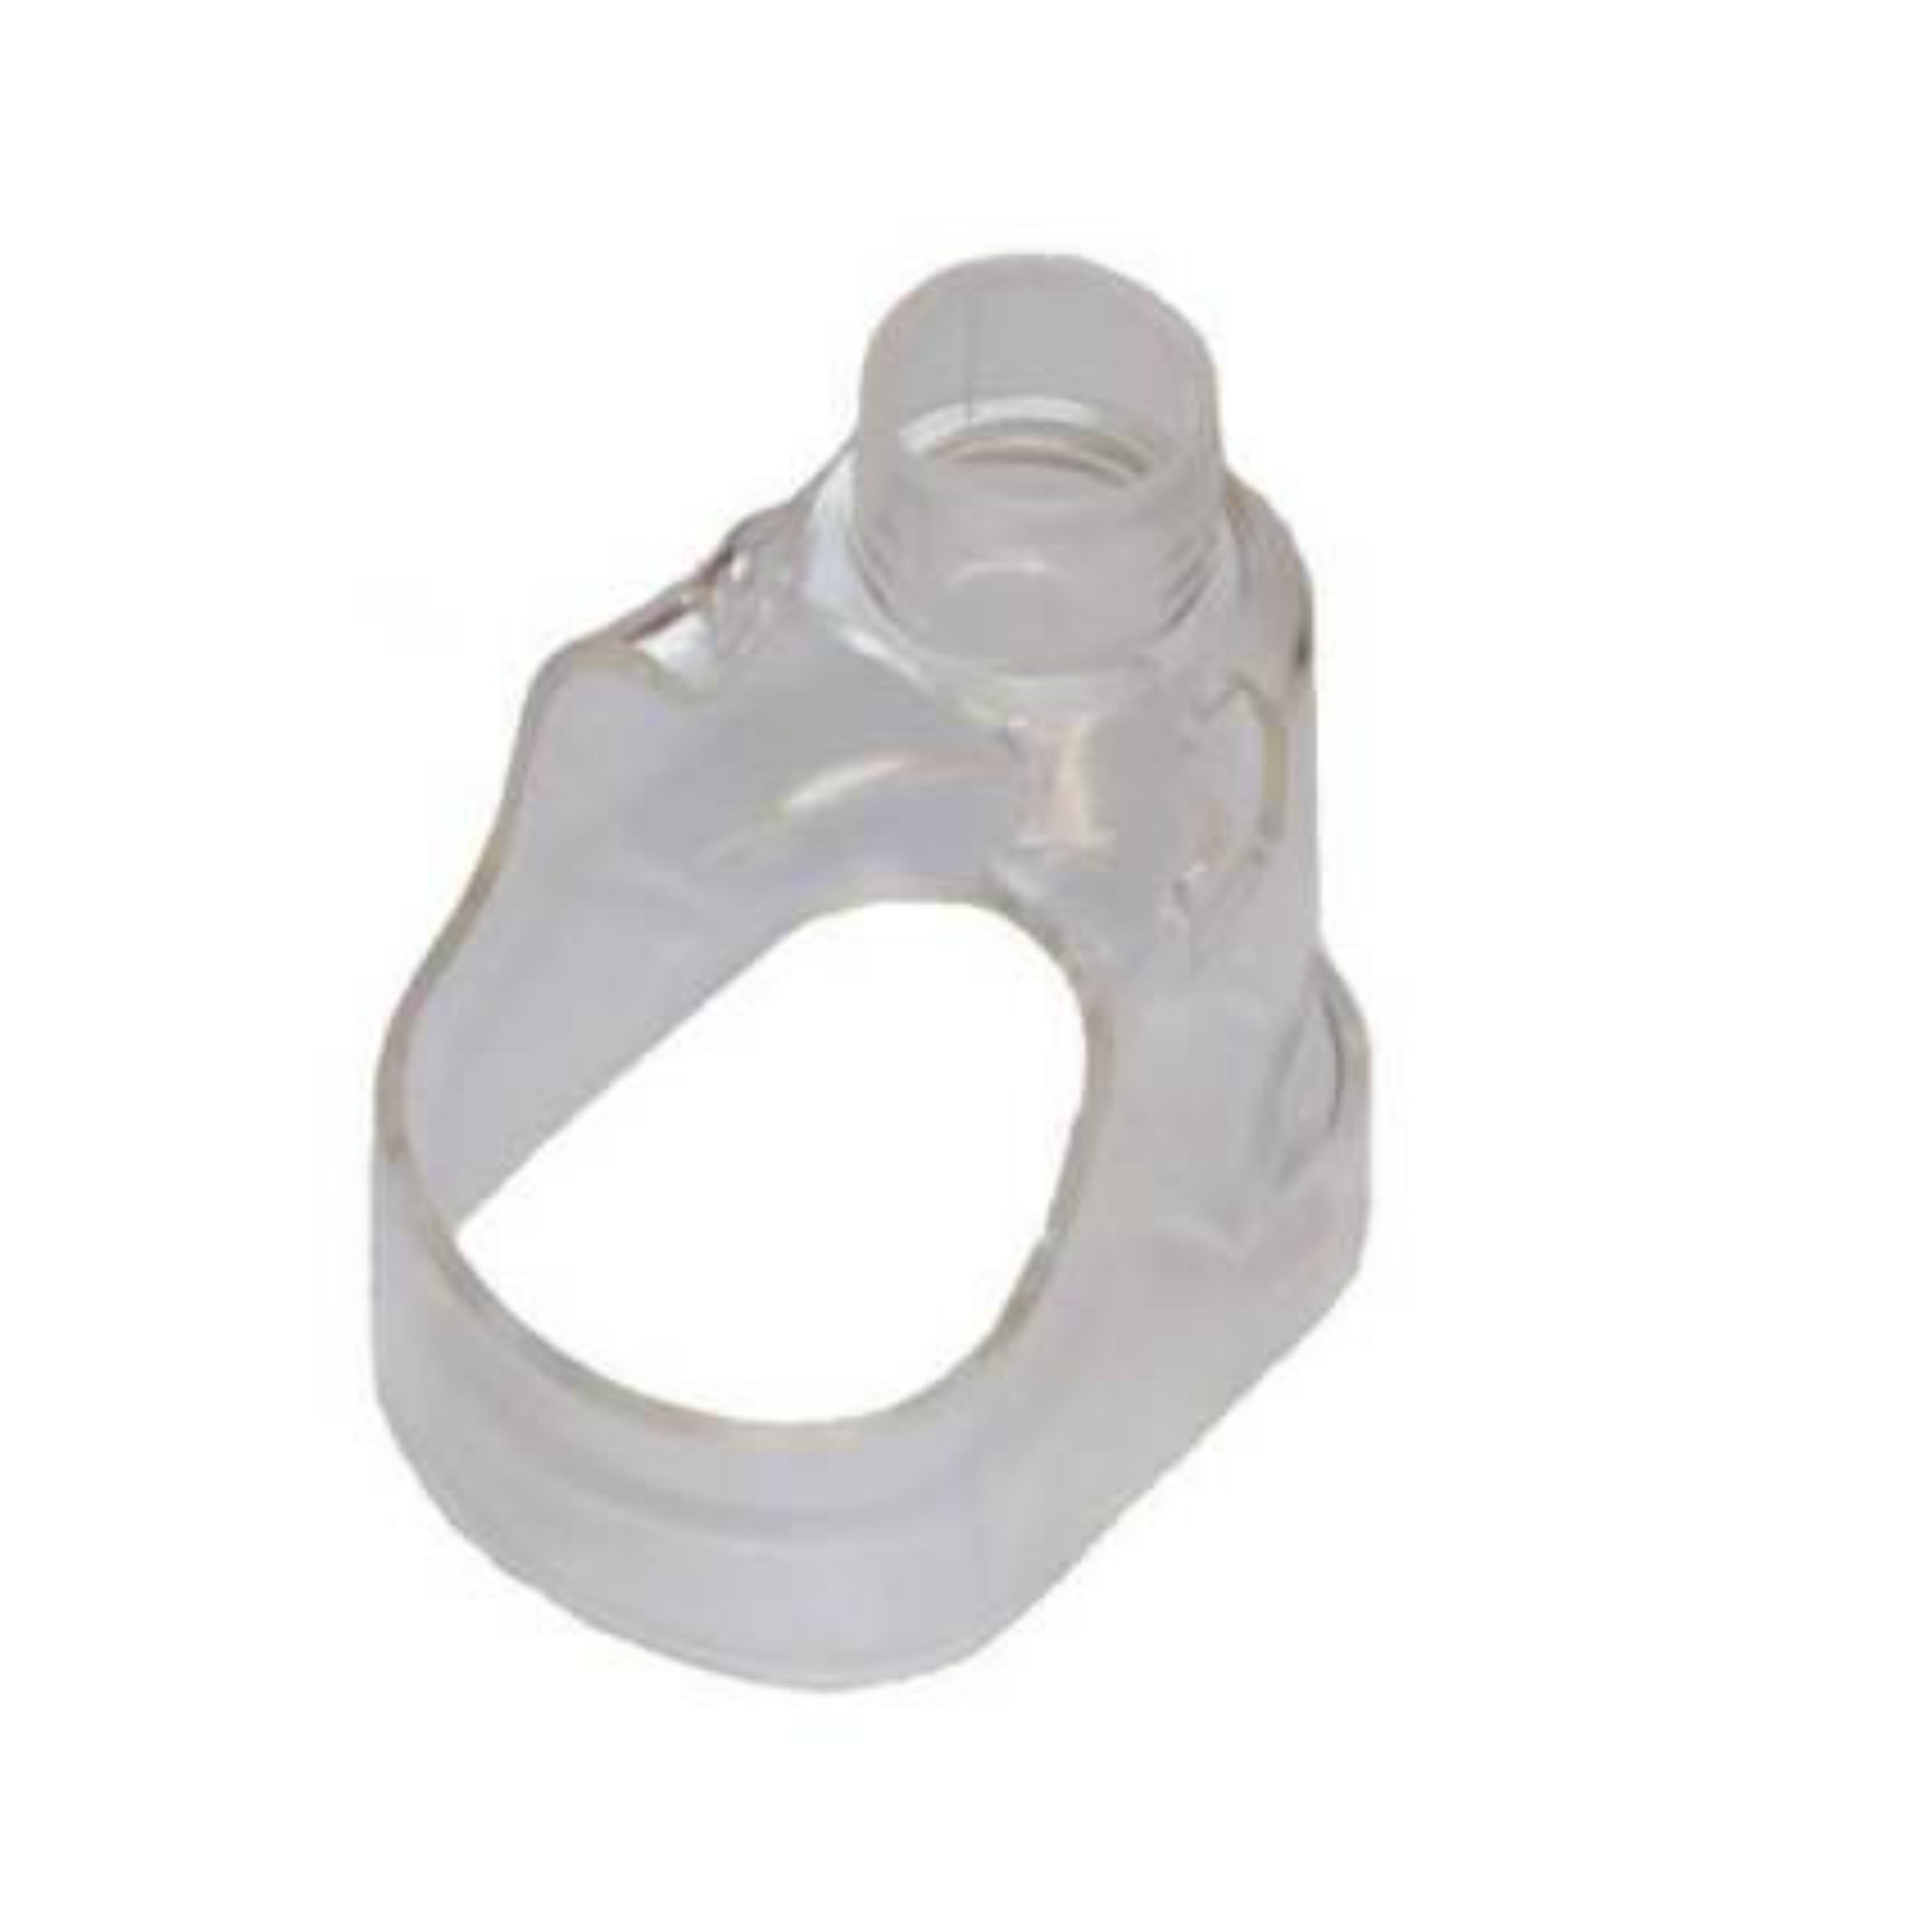 Omron 4997115-4 MicroAir U22 Mouthpiece & Mask Adaptor 9521435-0